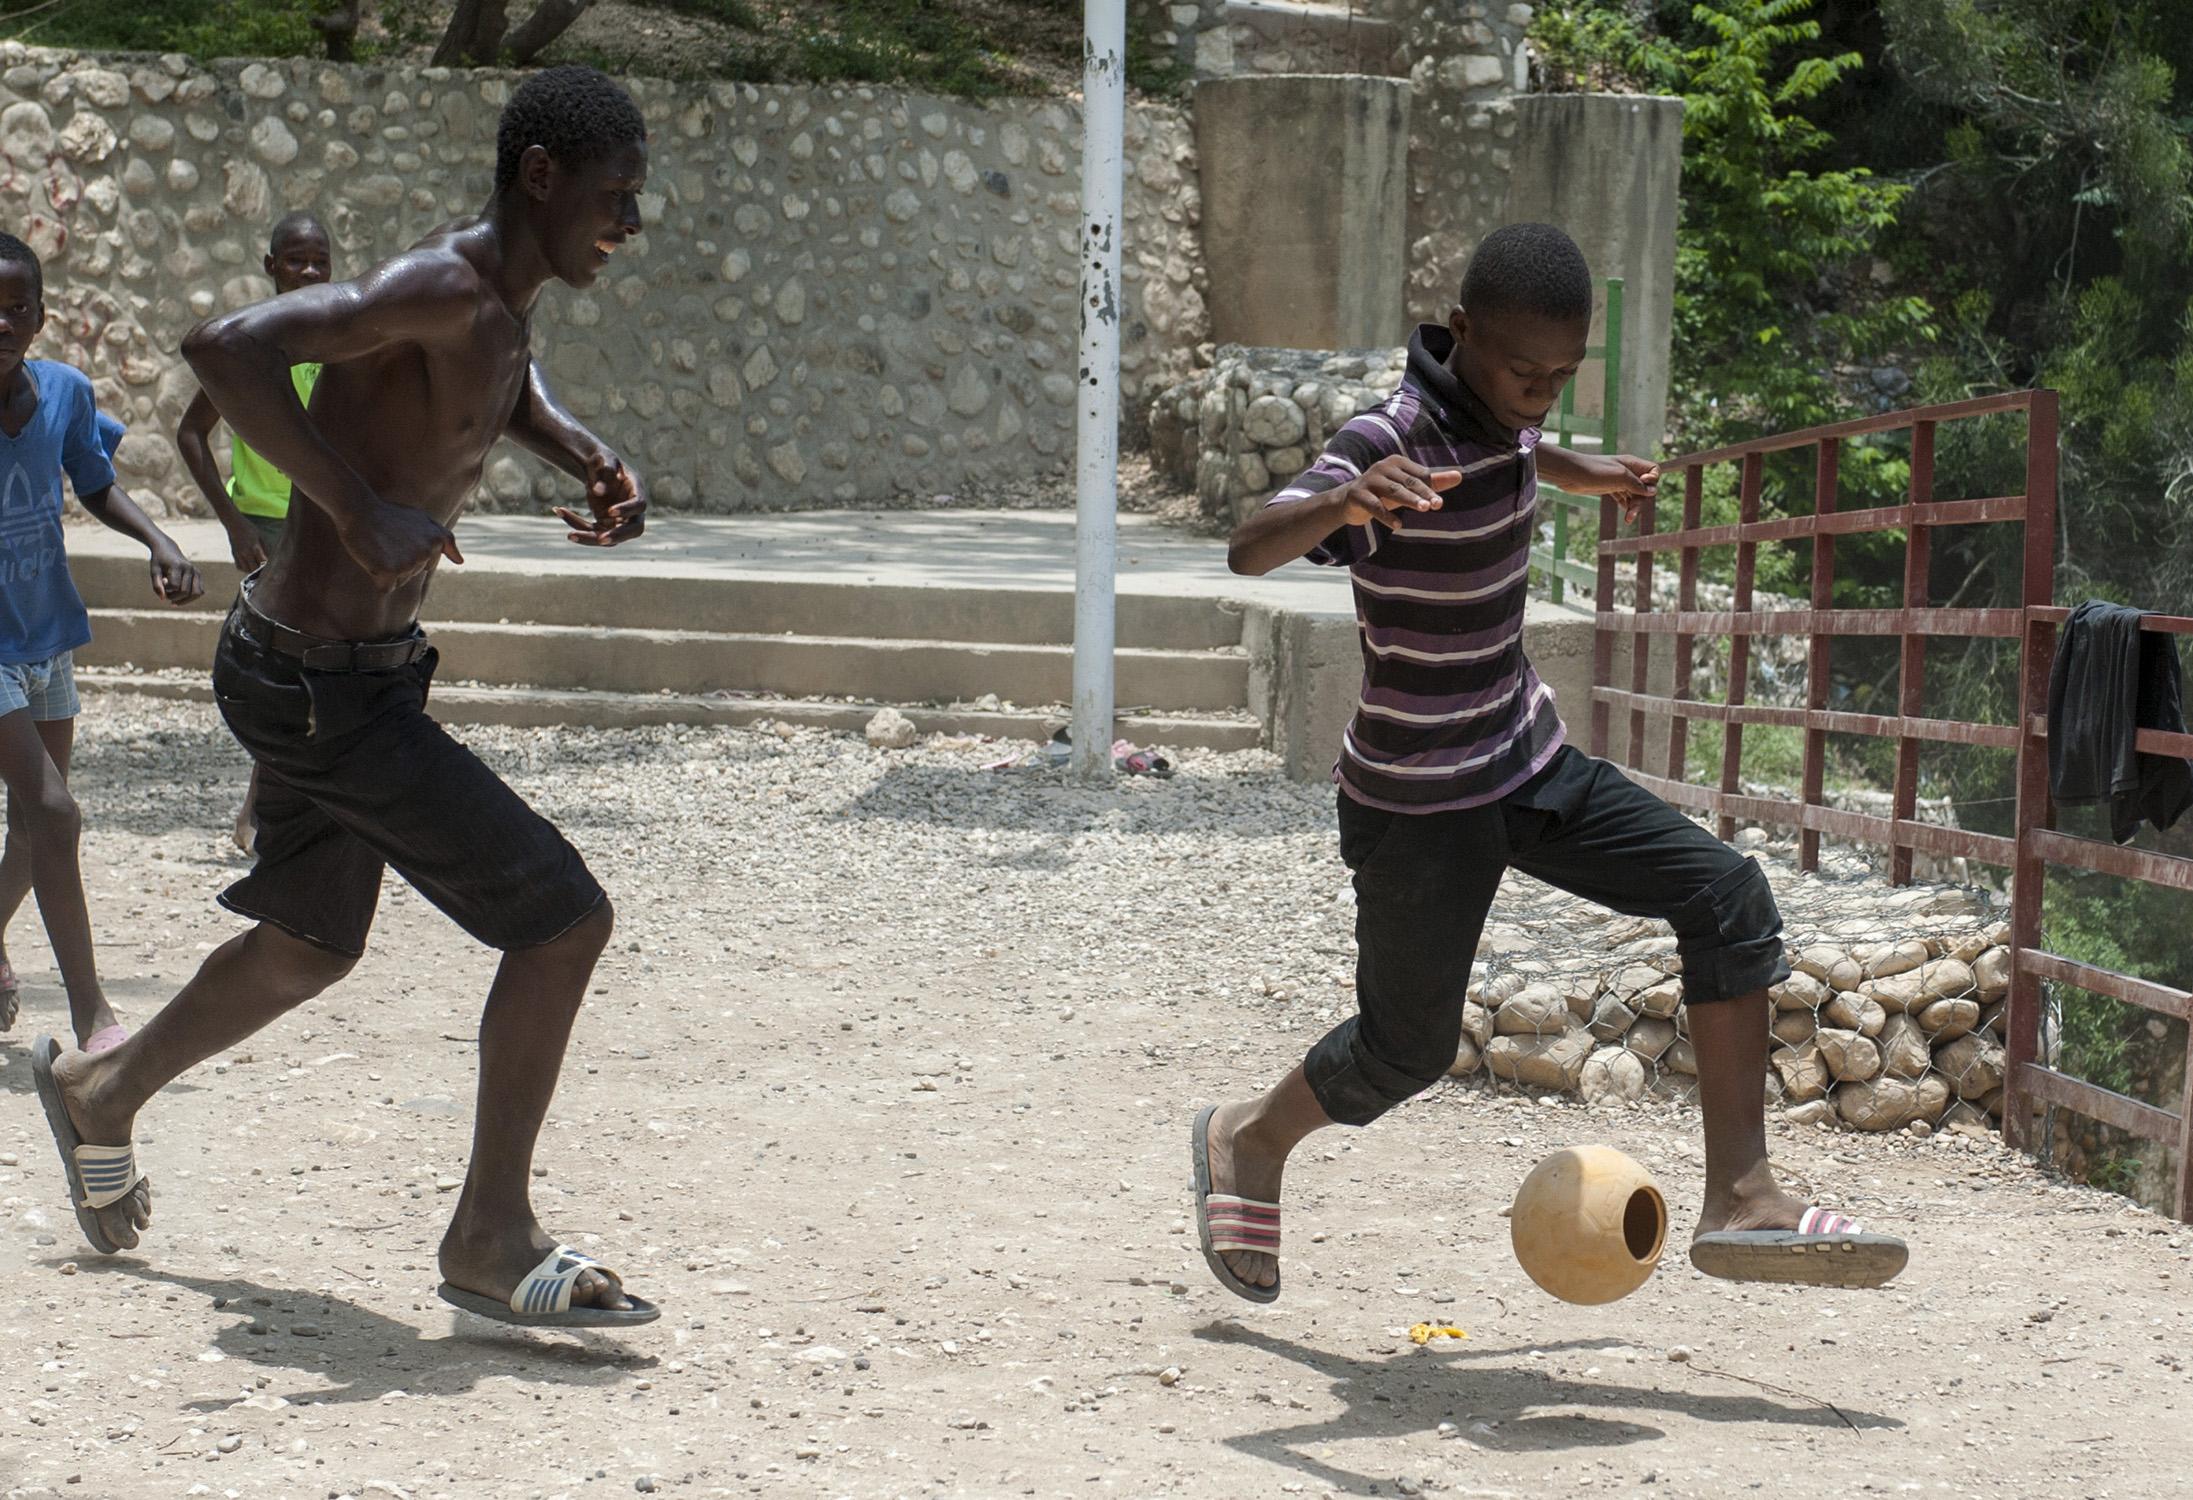 Haiti_LR_374 copy copy.jpg